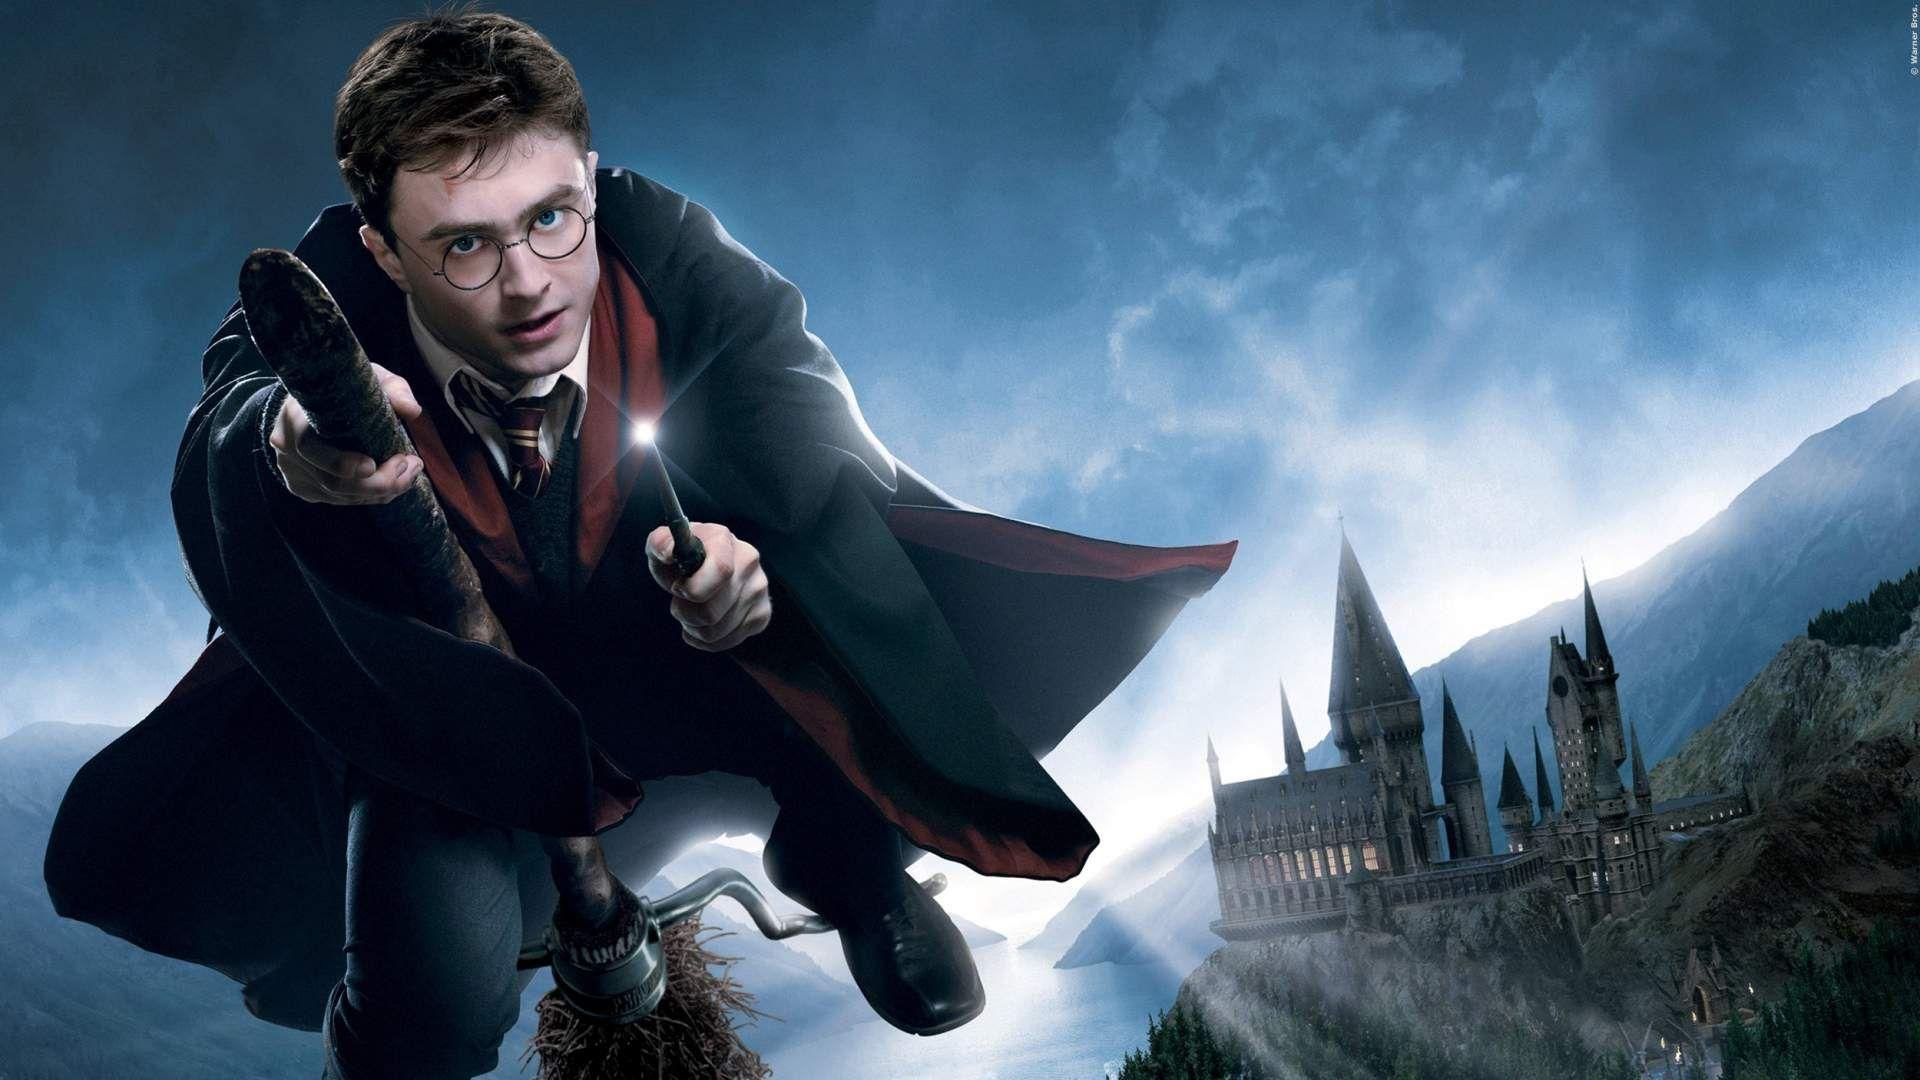 Fortsetzung Neuer Harry Potter Film Laut Daniel Radcliffe Sicher Harry Potter Spiele Harry Potter Quiz Harry Potter Fakten